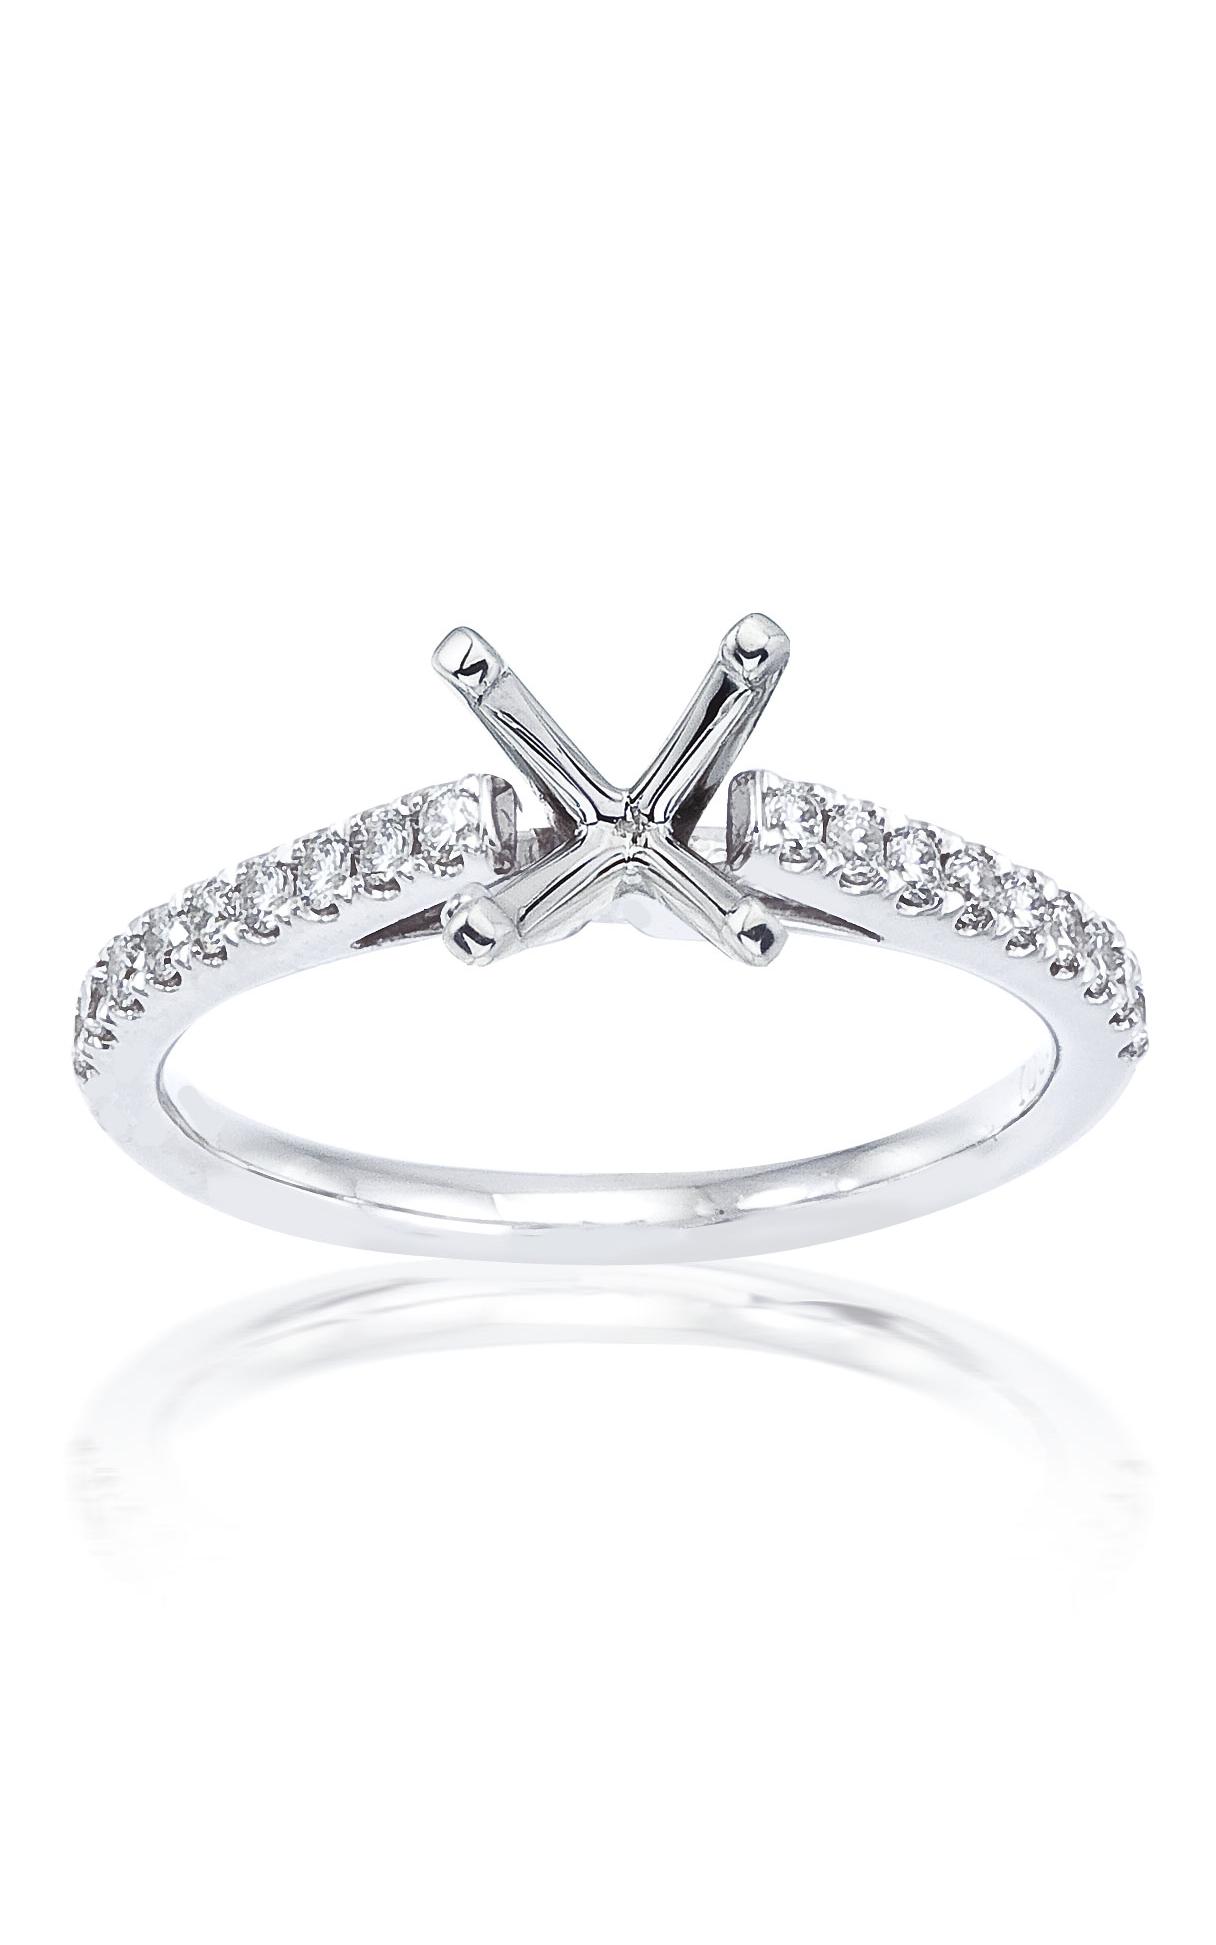 Imagine Bridal Engagement Rings 61886D-1 4 product image